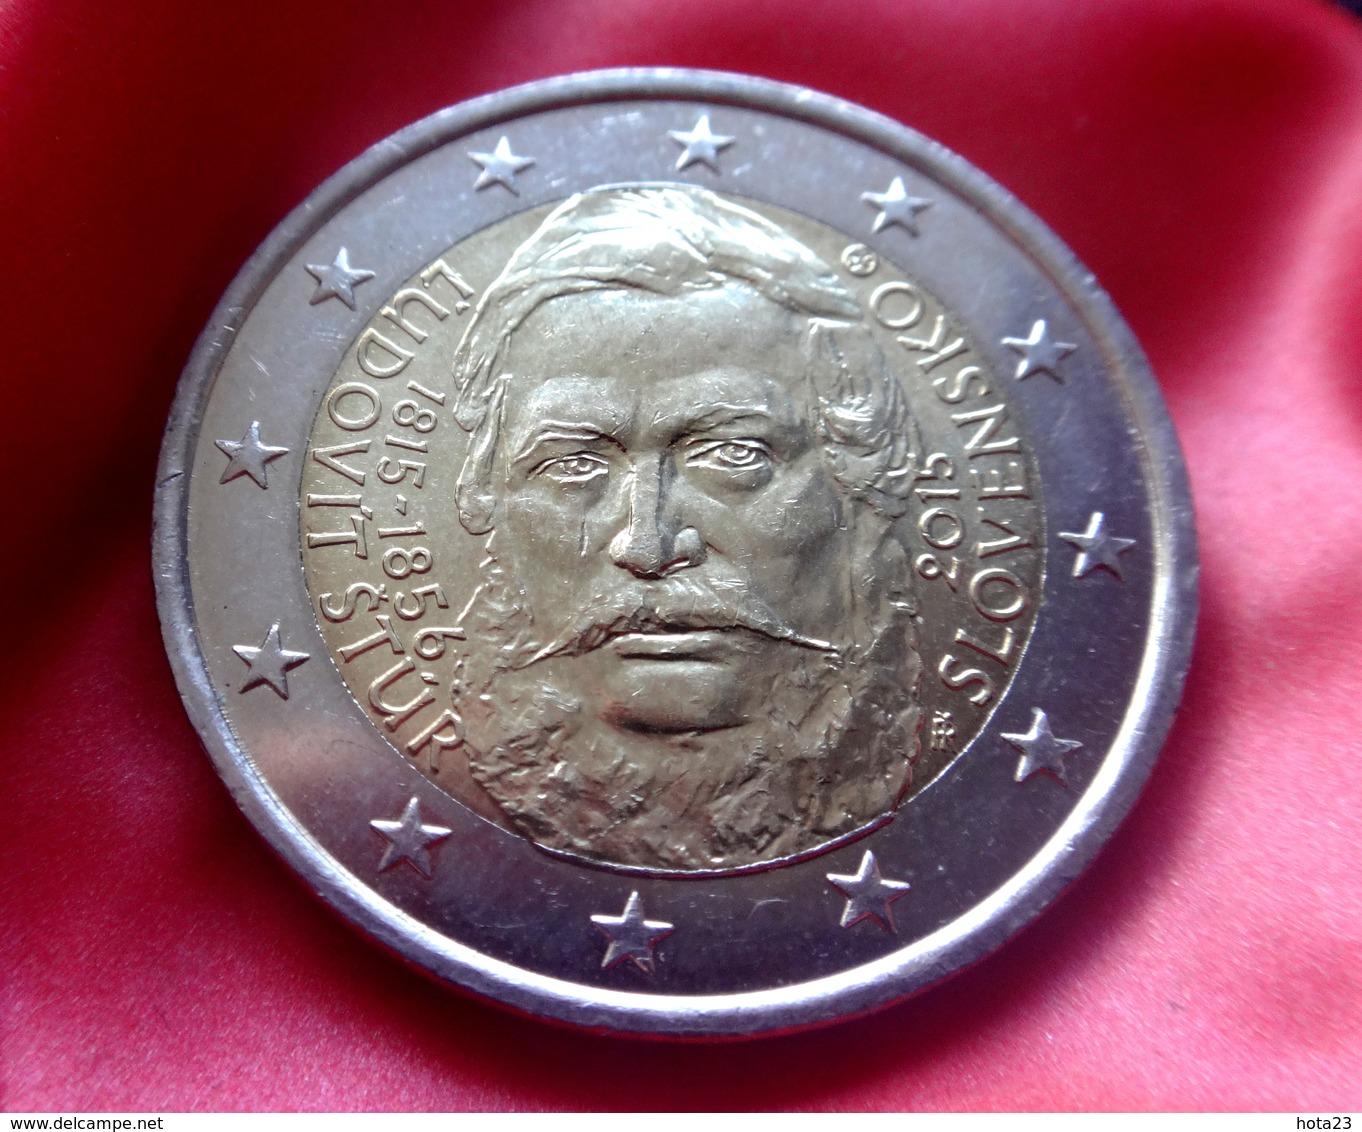 Slovakia 2 Euro 2015 Ludovit Stur  Coin  CIRCULATED - Eslovaquia